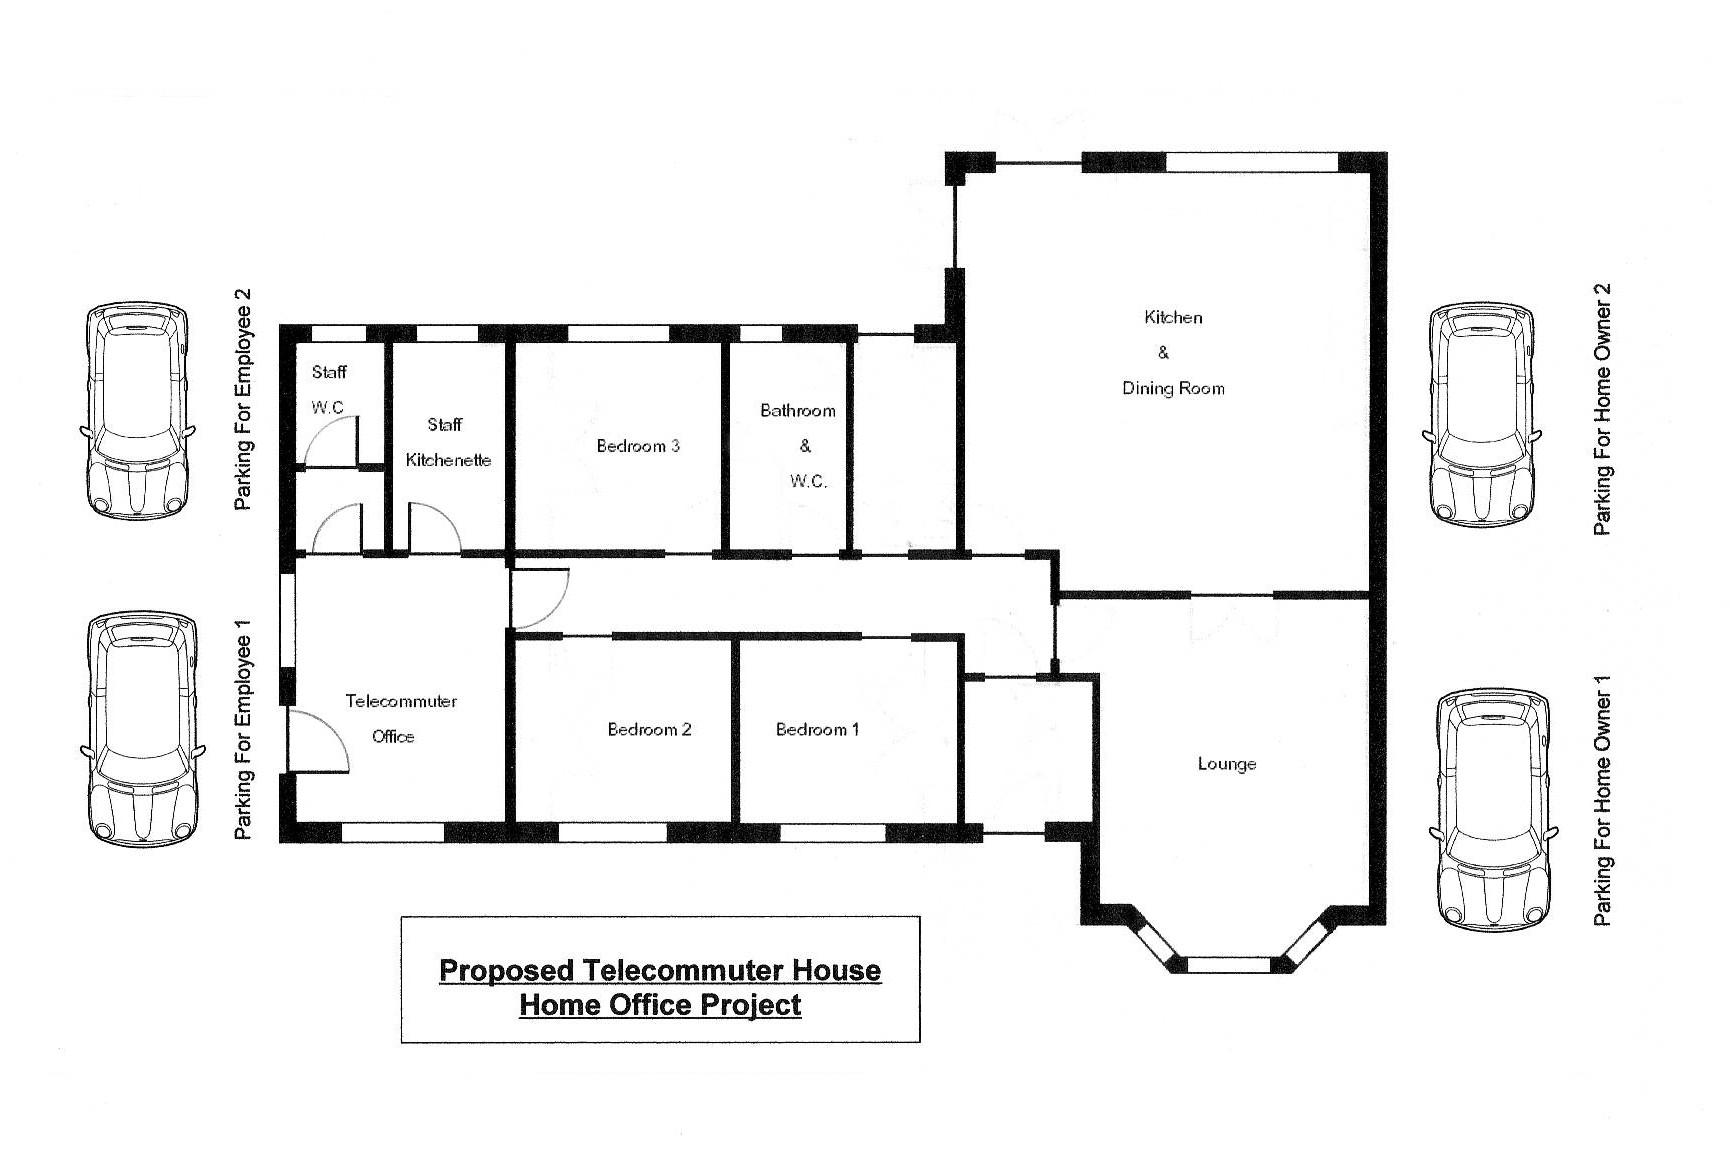 Telecommuter House Architectural Vernacular Design